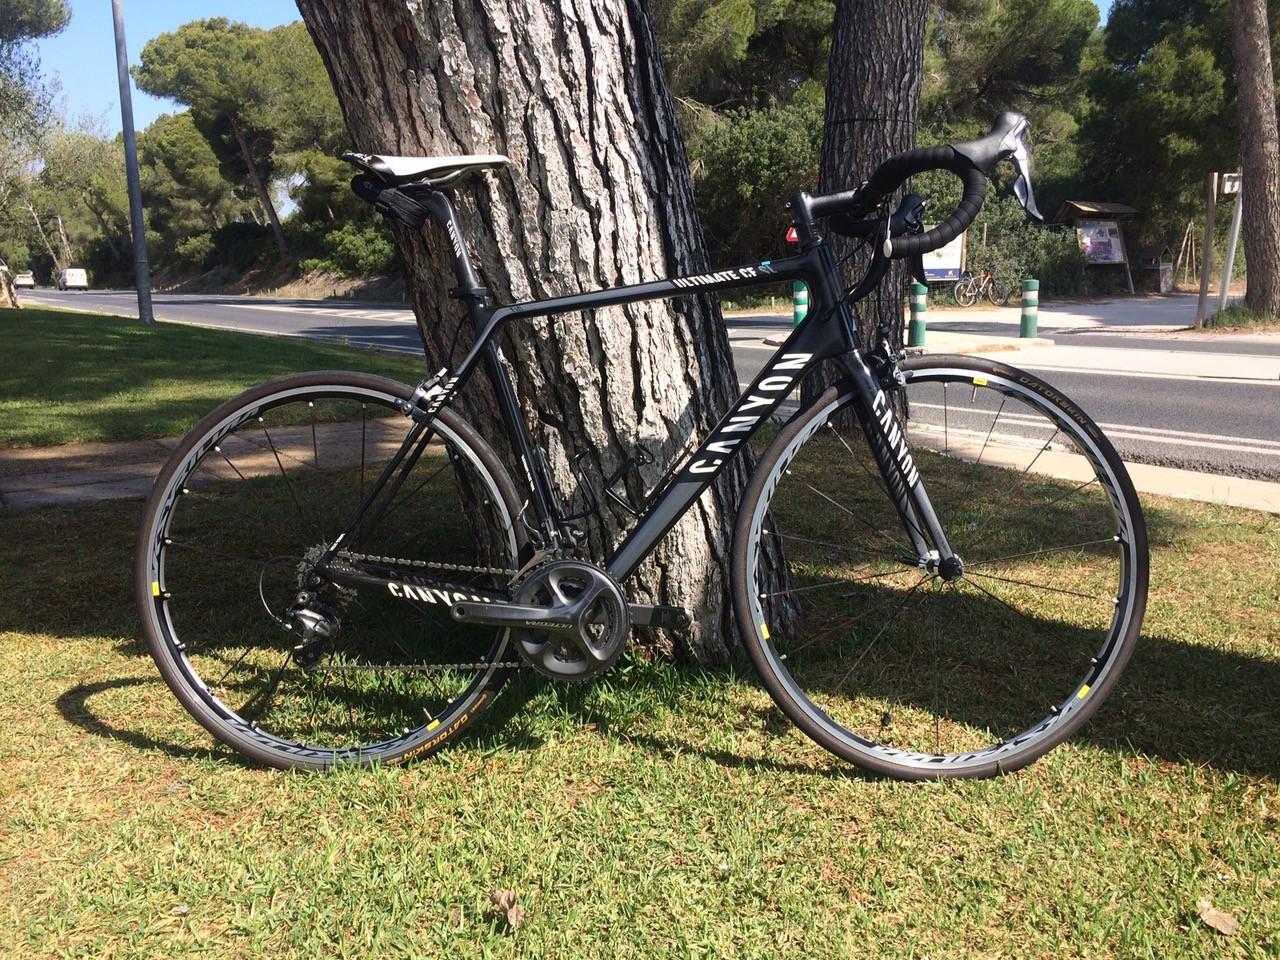 Mietrad zum Verkauf - CANYON Ultimate CF SL 9.0